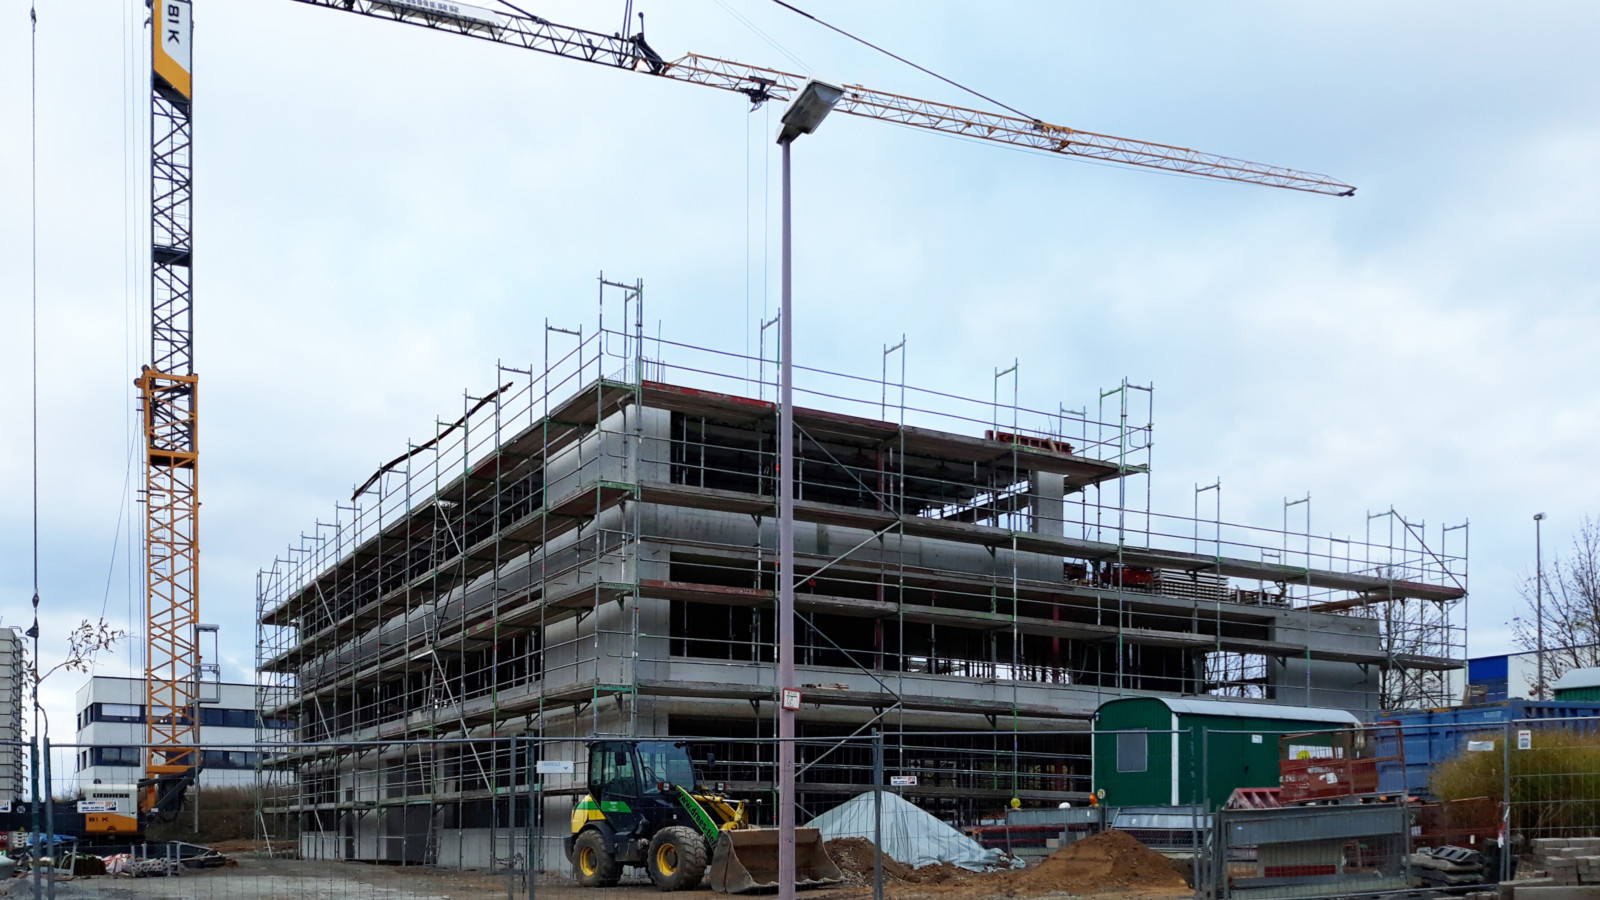 PVS Unna Neubau Bürogebäude